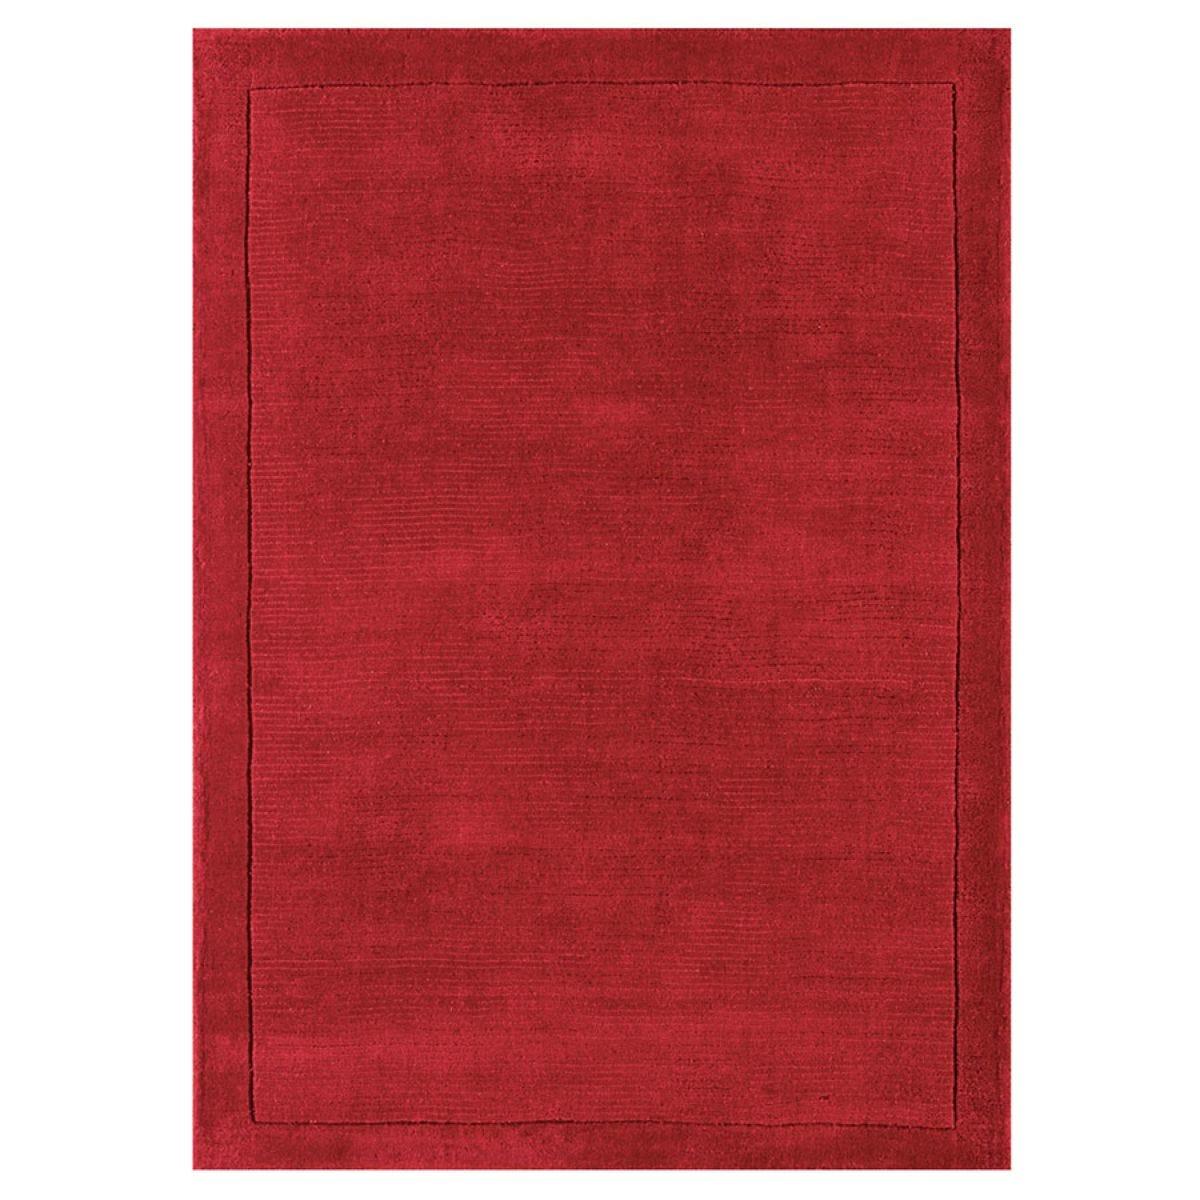 Asiatic York Handloom Rug, 60x120cm